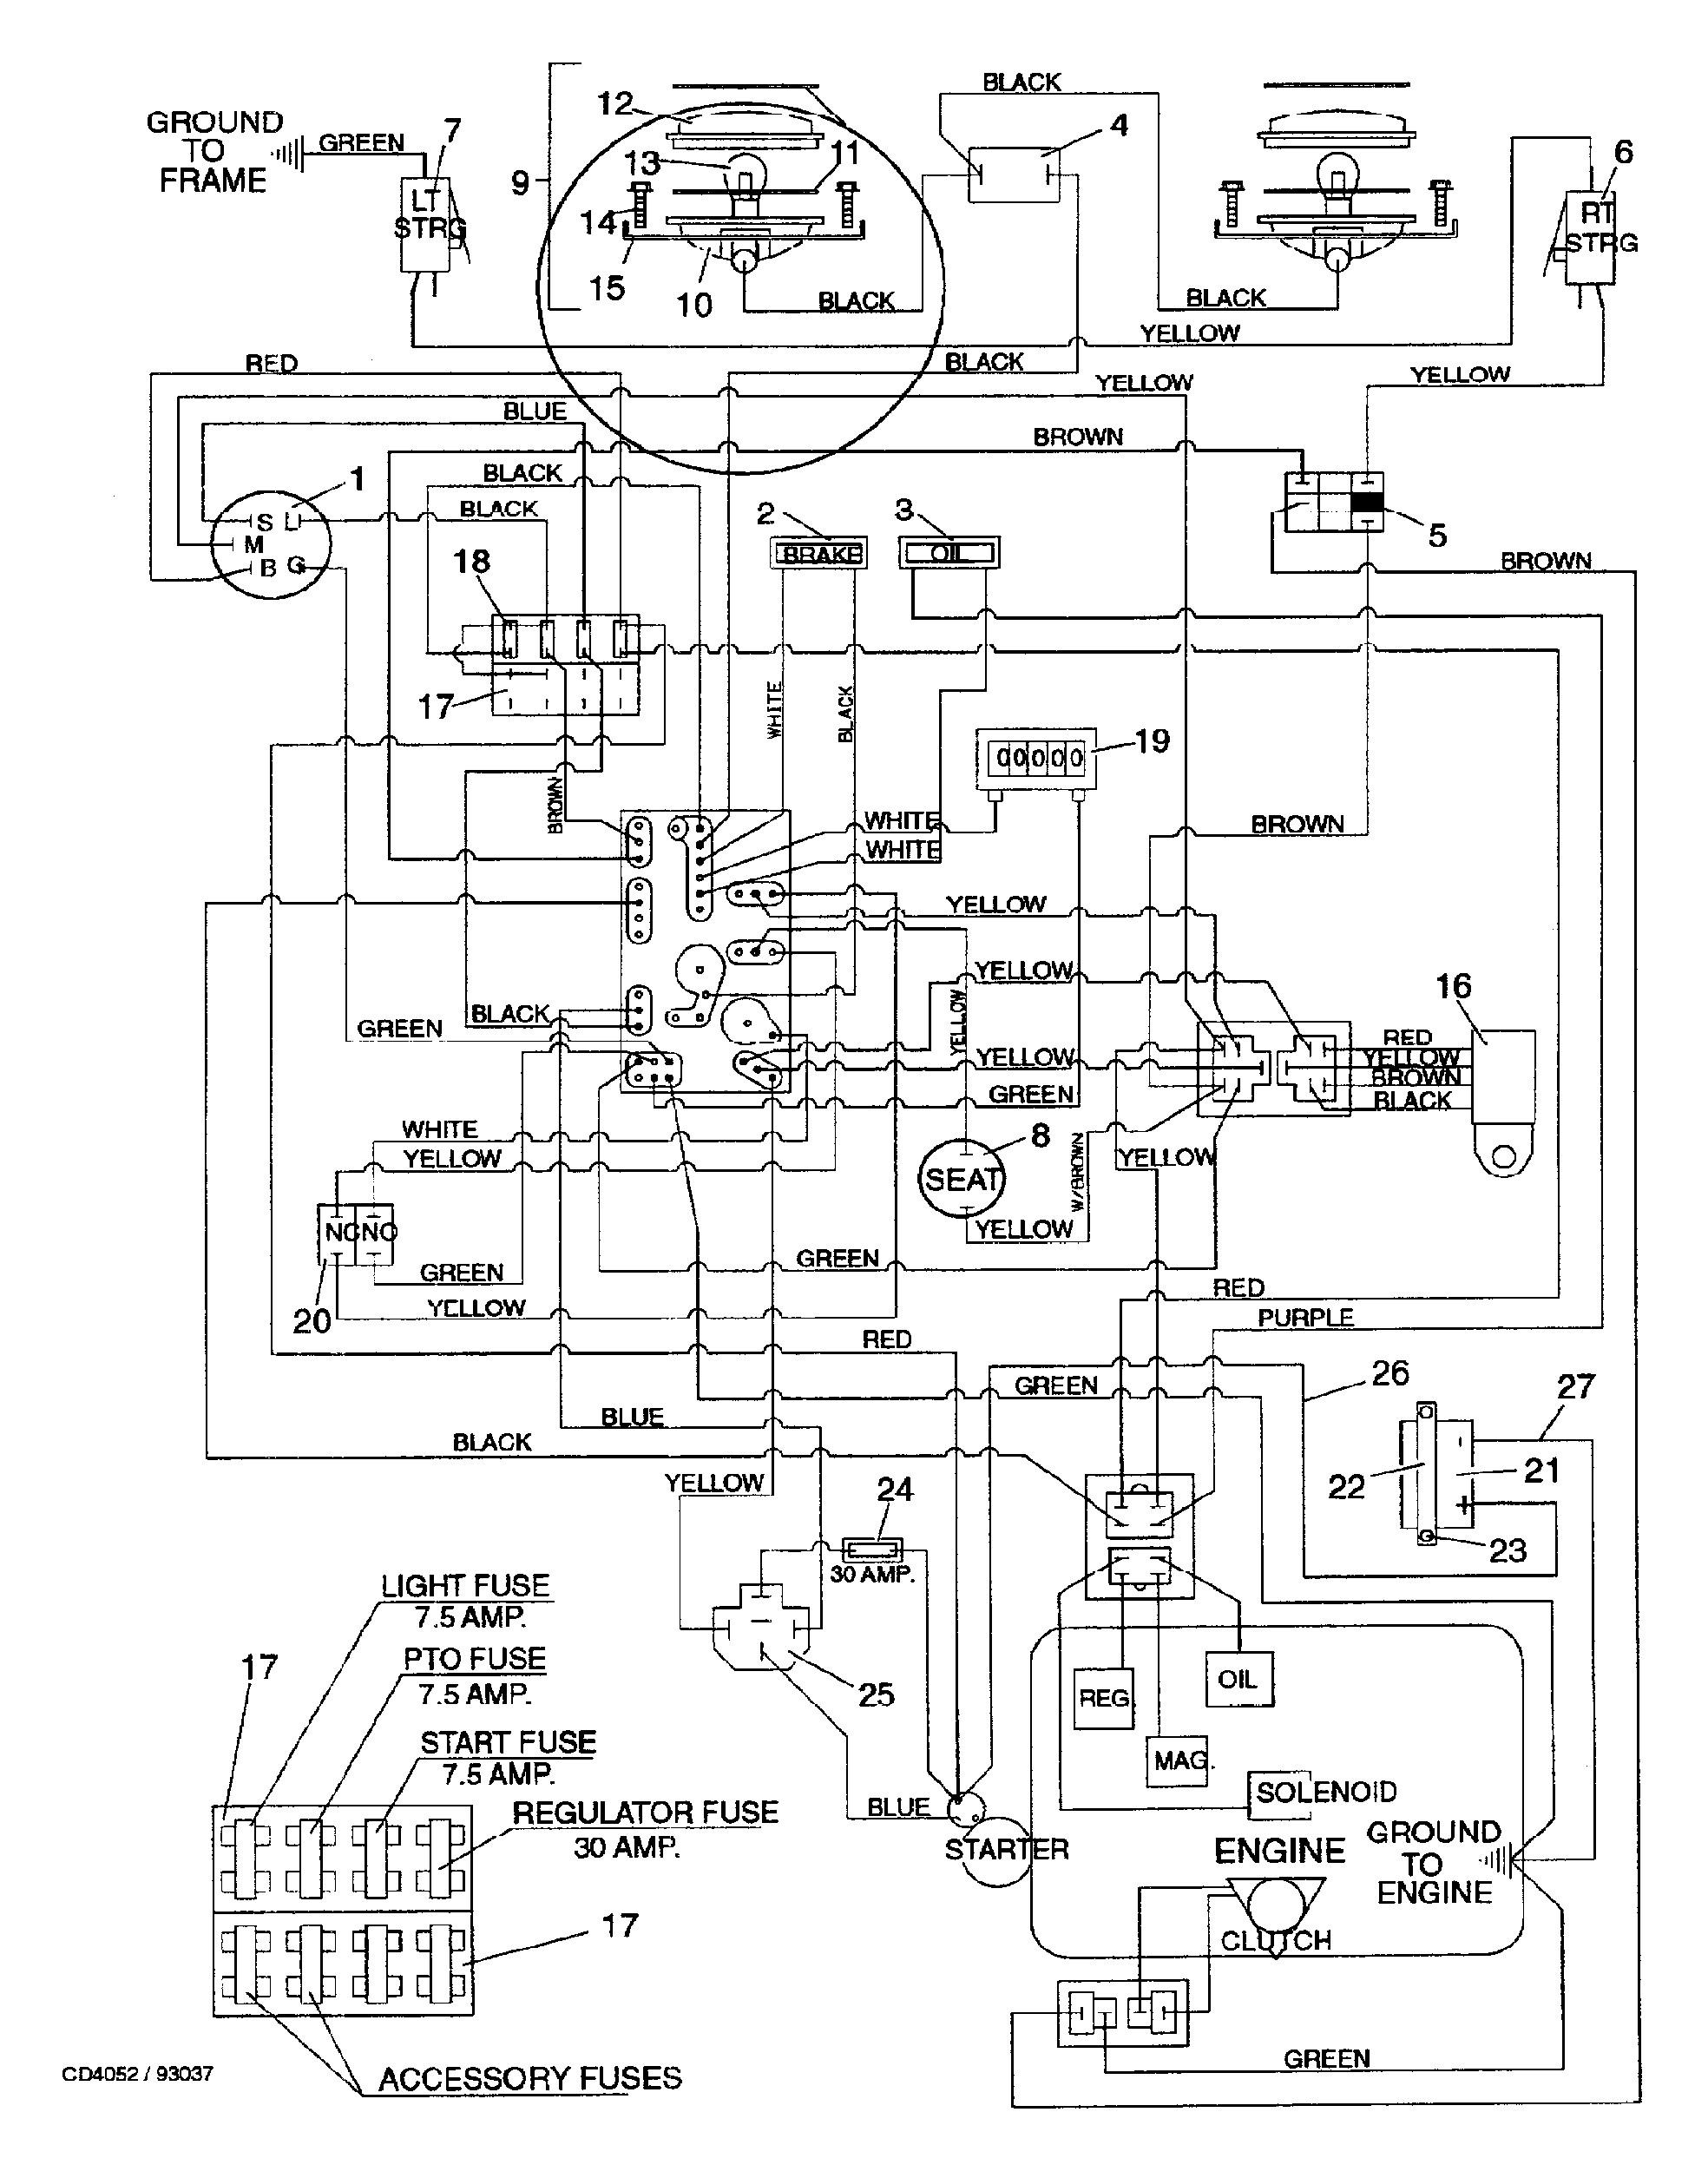 Troy Bilt Riding Mower Wiring Diagram